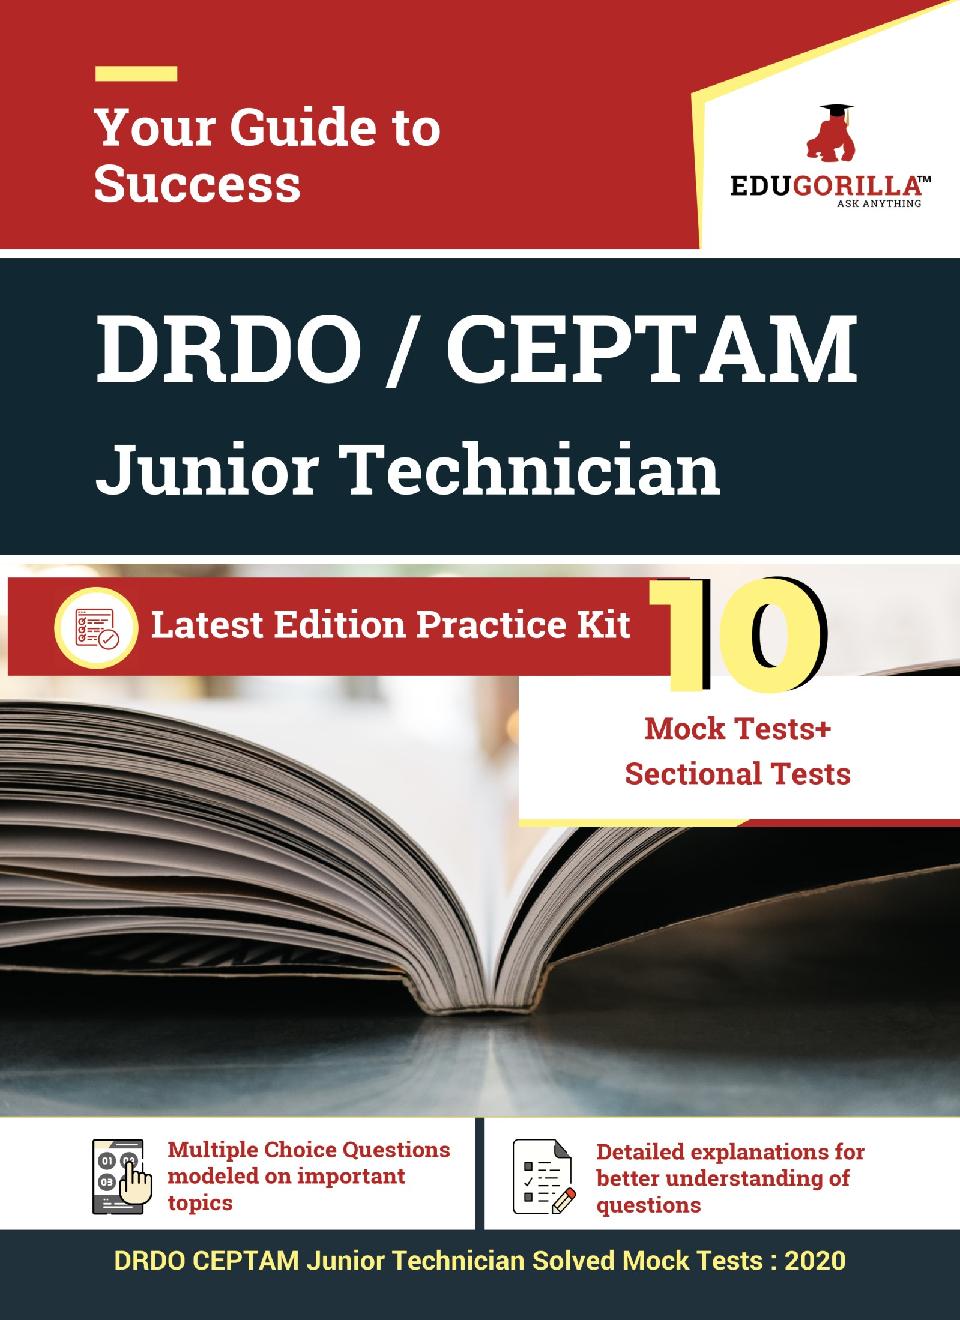 EduGorilla DRDO CEPTAM Junior Technician - 2020 - 10 Mock Test + 24  Sectional Test - Page 1